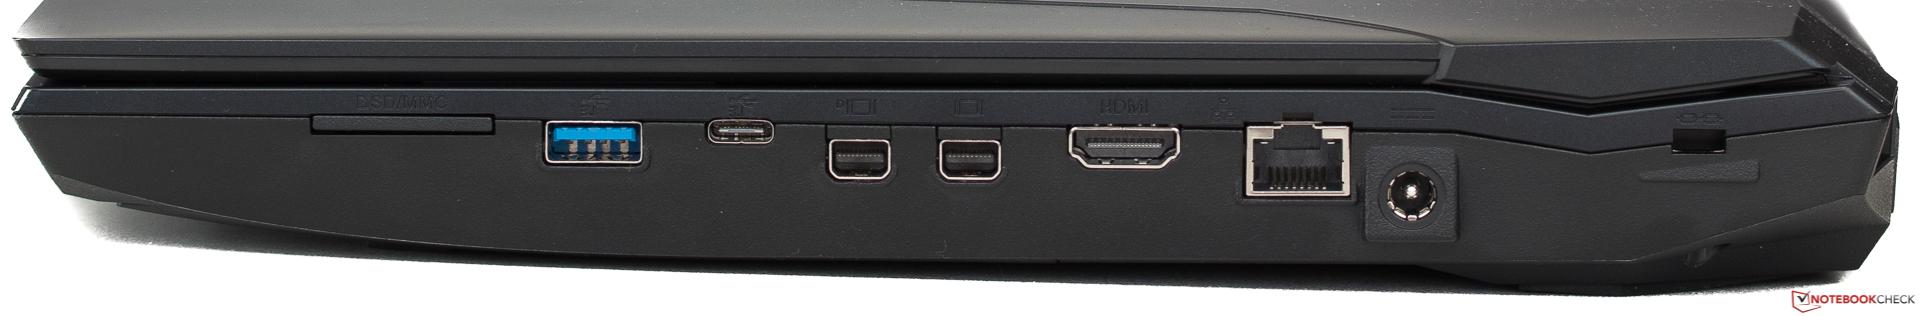 Schenker XMG Apex 15 (Clevo N950TP6) Laptop Review - NotebookCheck